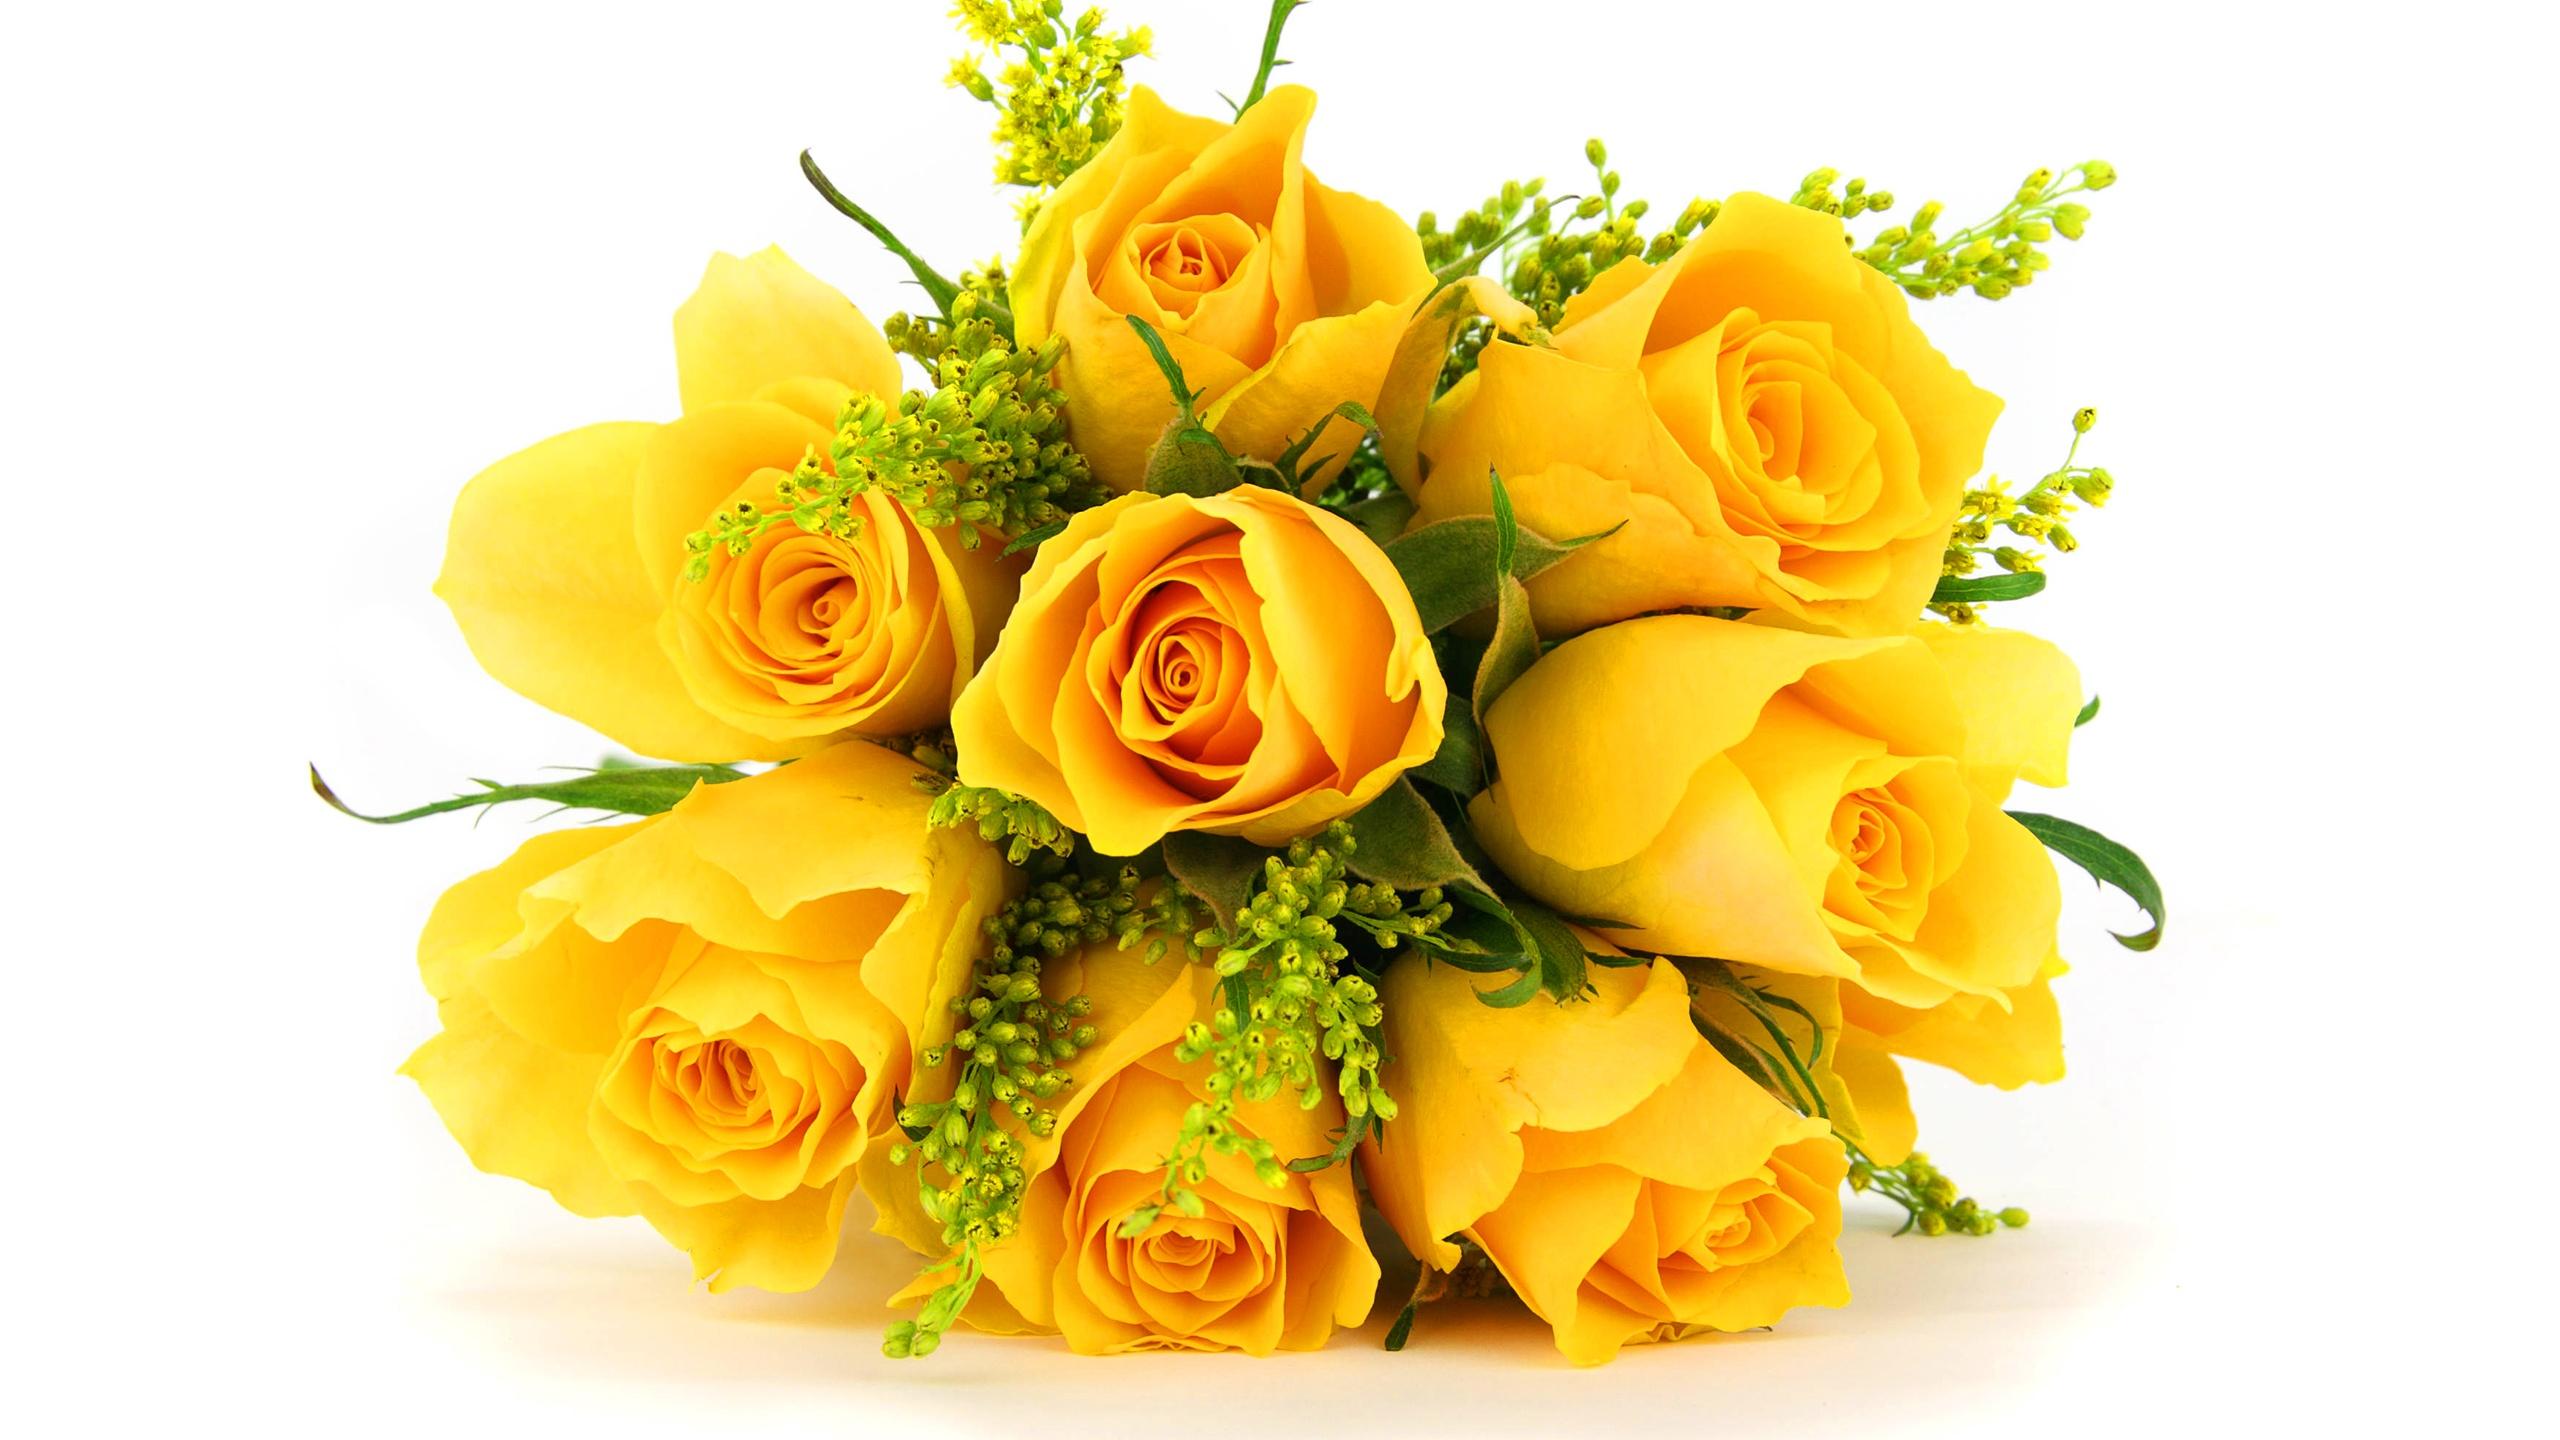 Hd wallpaper yellow rose - Hd Wallpaper Yellow Rose Hd Wallpaper Yellow Rose 6